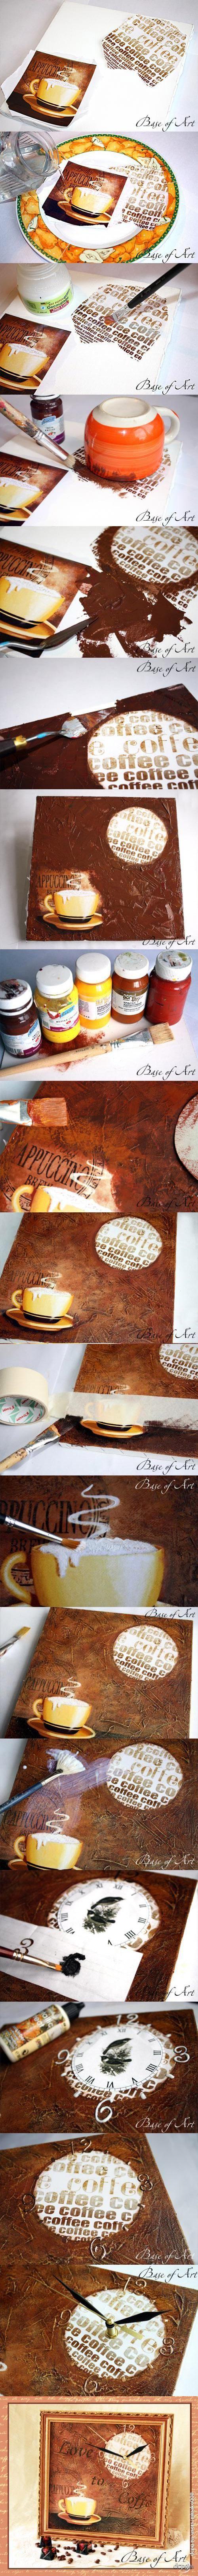 "Декупаж - Сайт любителей декупажа - DCPG.RU   Часы-картина ""Love to coffe"". Мастер-класс от ""Base of Art""."